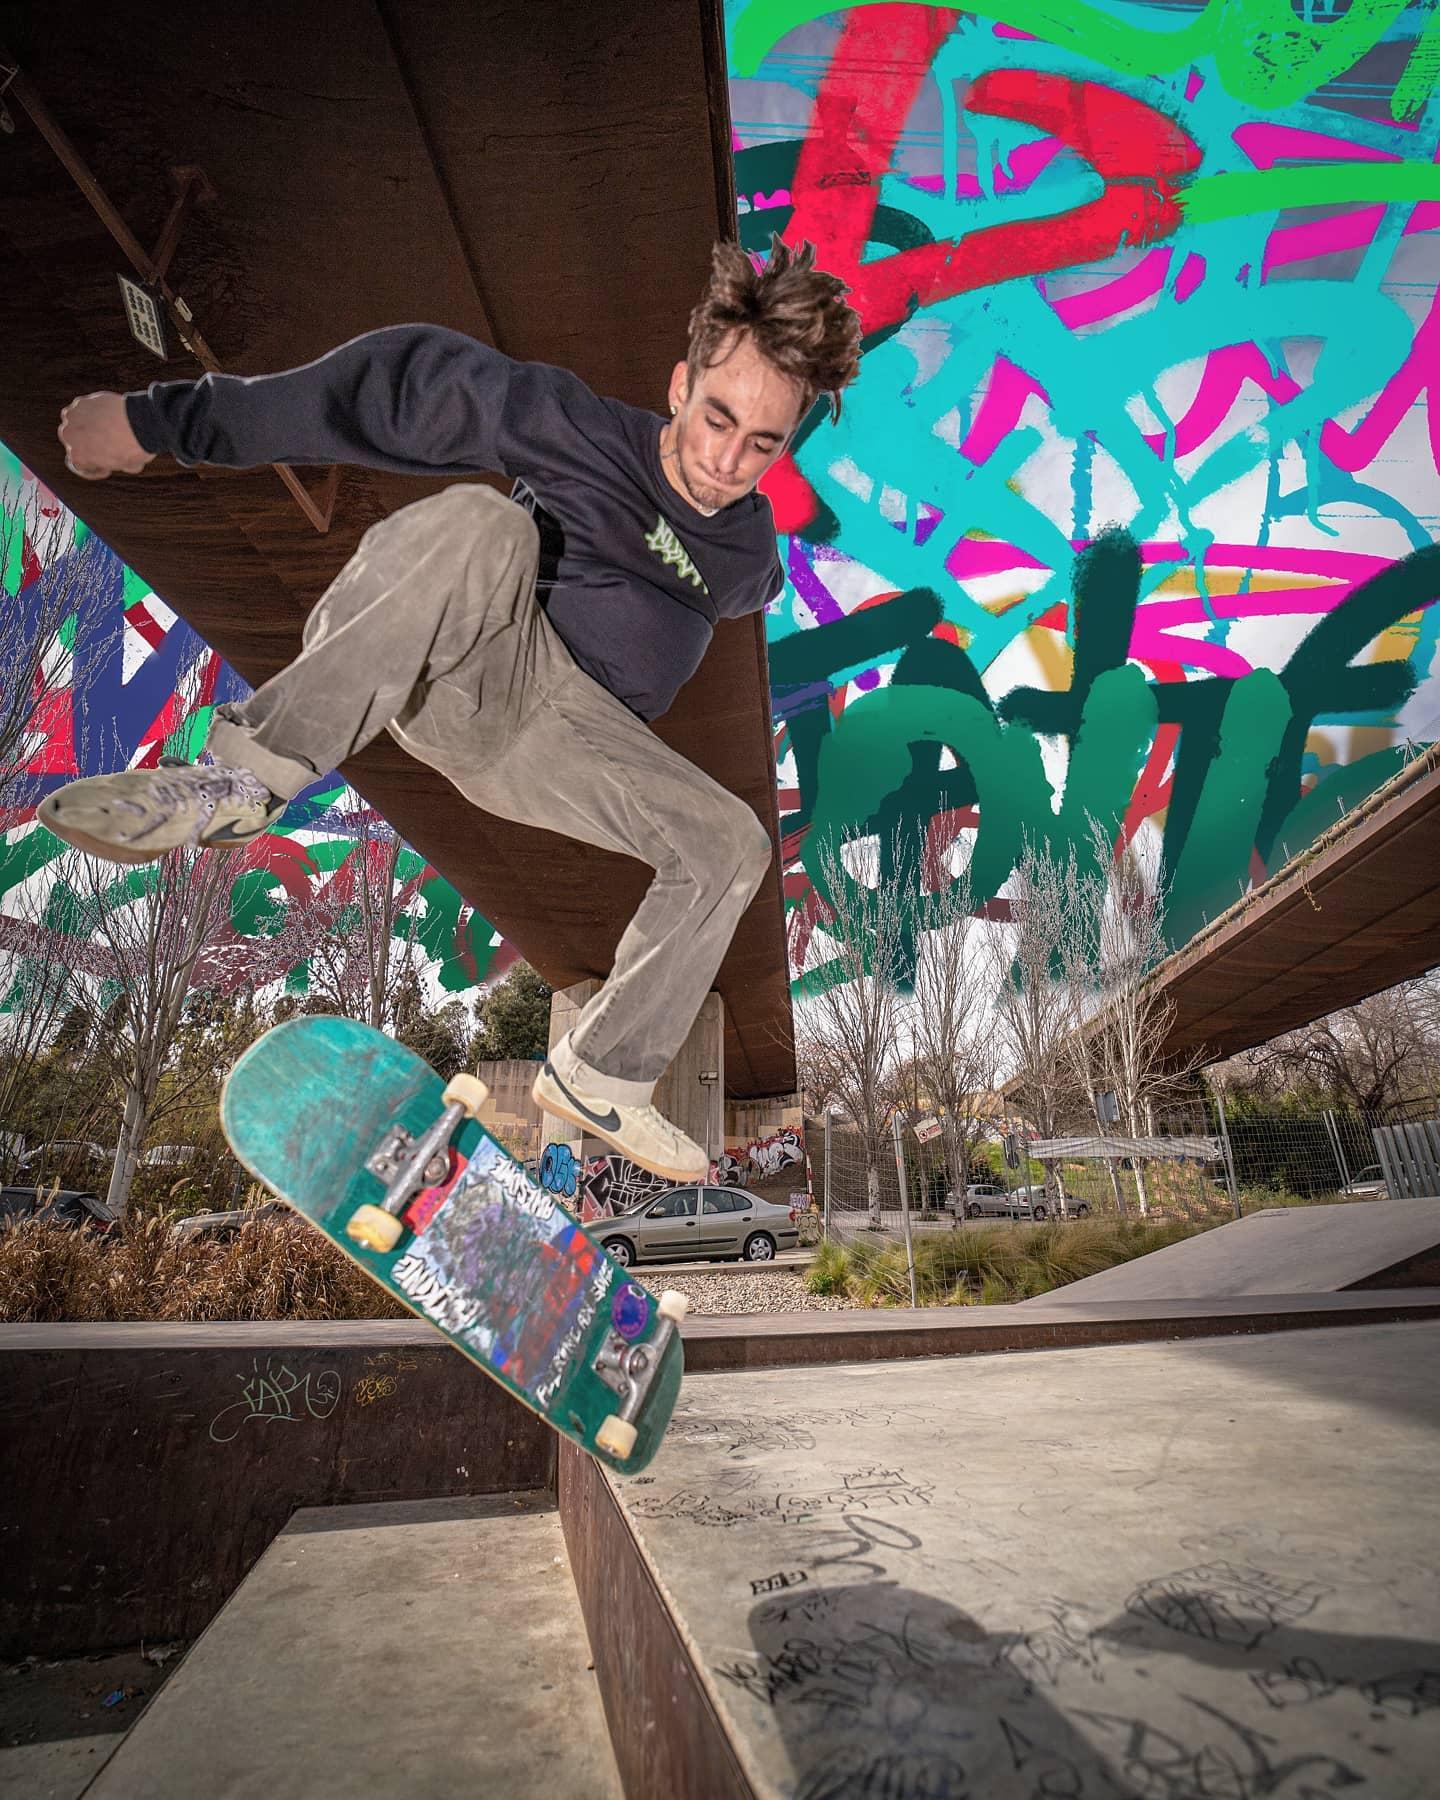 1986 pictureoftheday photography grunge edit streetwear skatetricks graffiti graffitiart sb skateboard skate